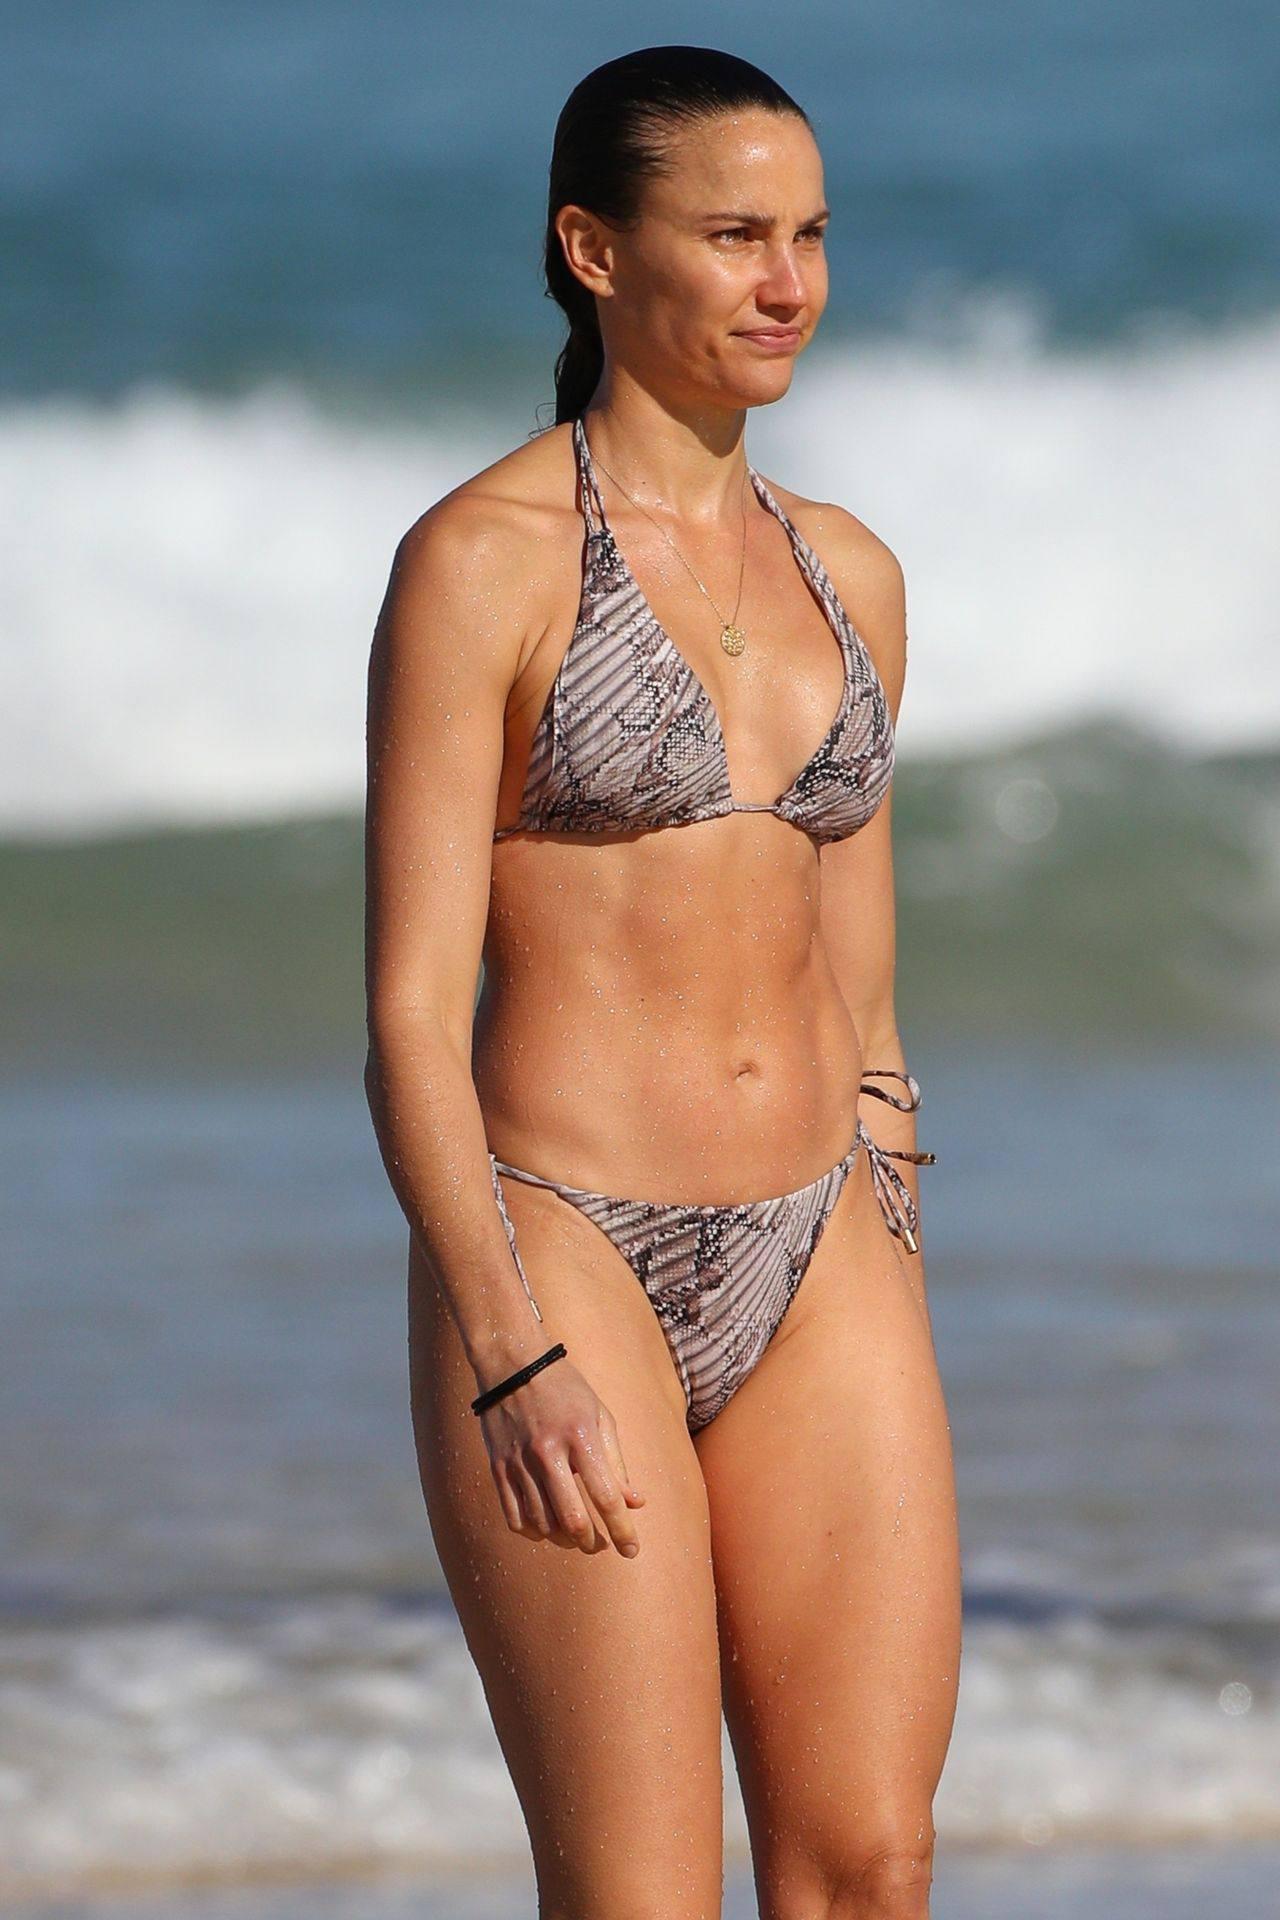 Rachael Finch – Hot Body In Sexy Bikini At The Bondi Beach In Sydney 0010